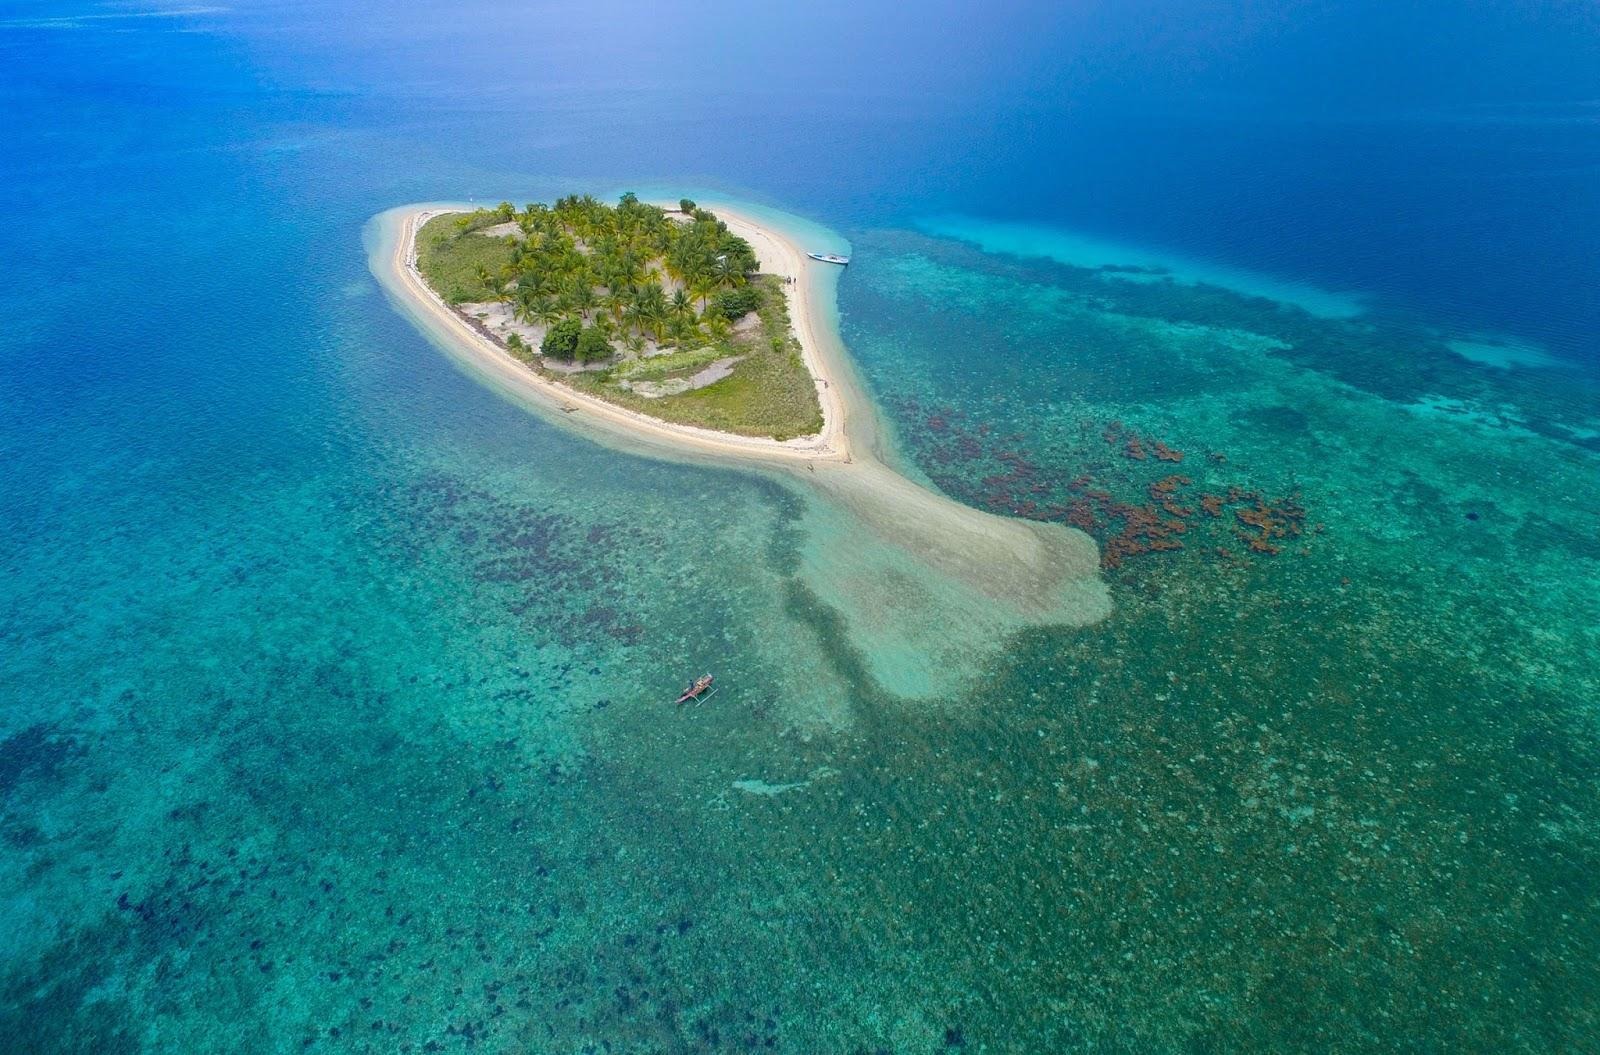 Bedil Island